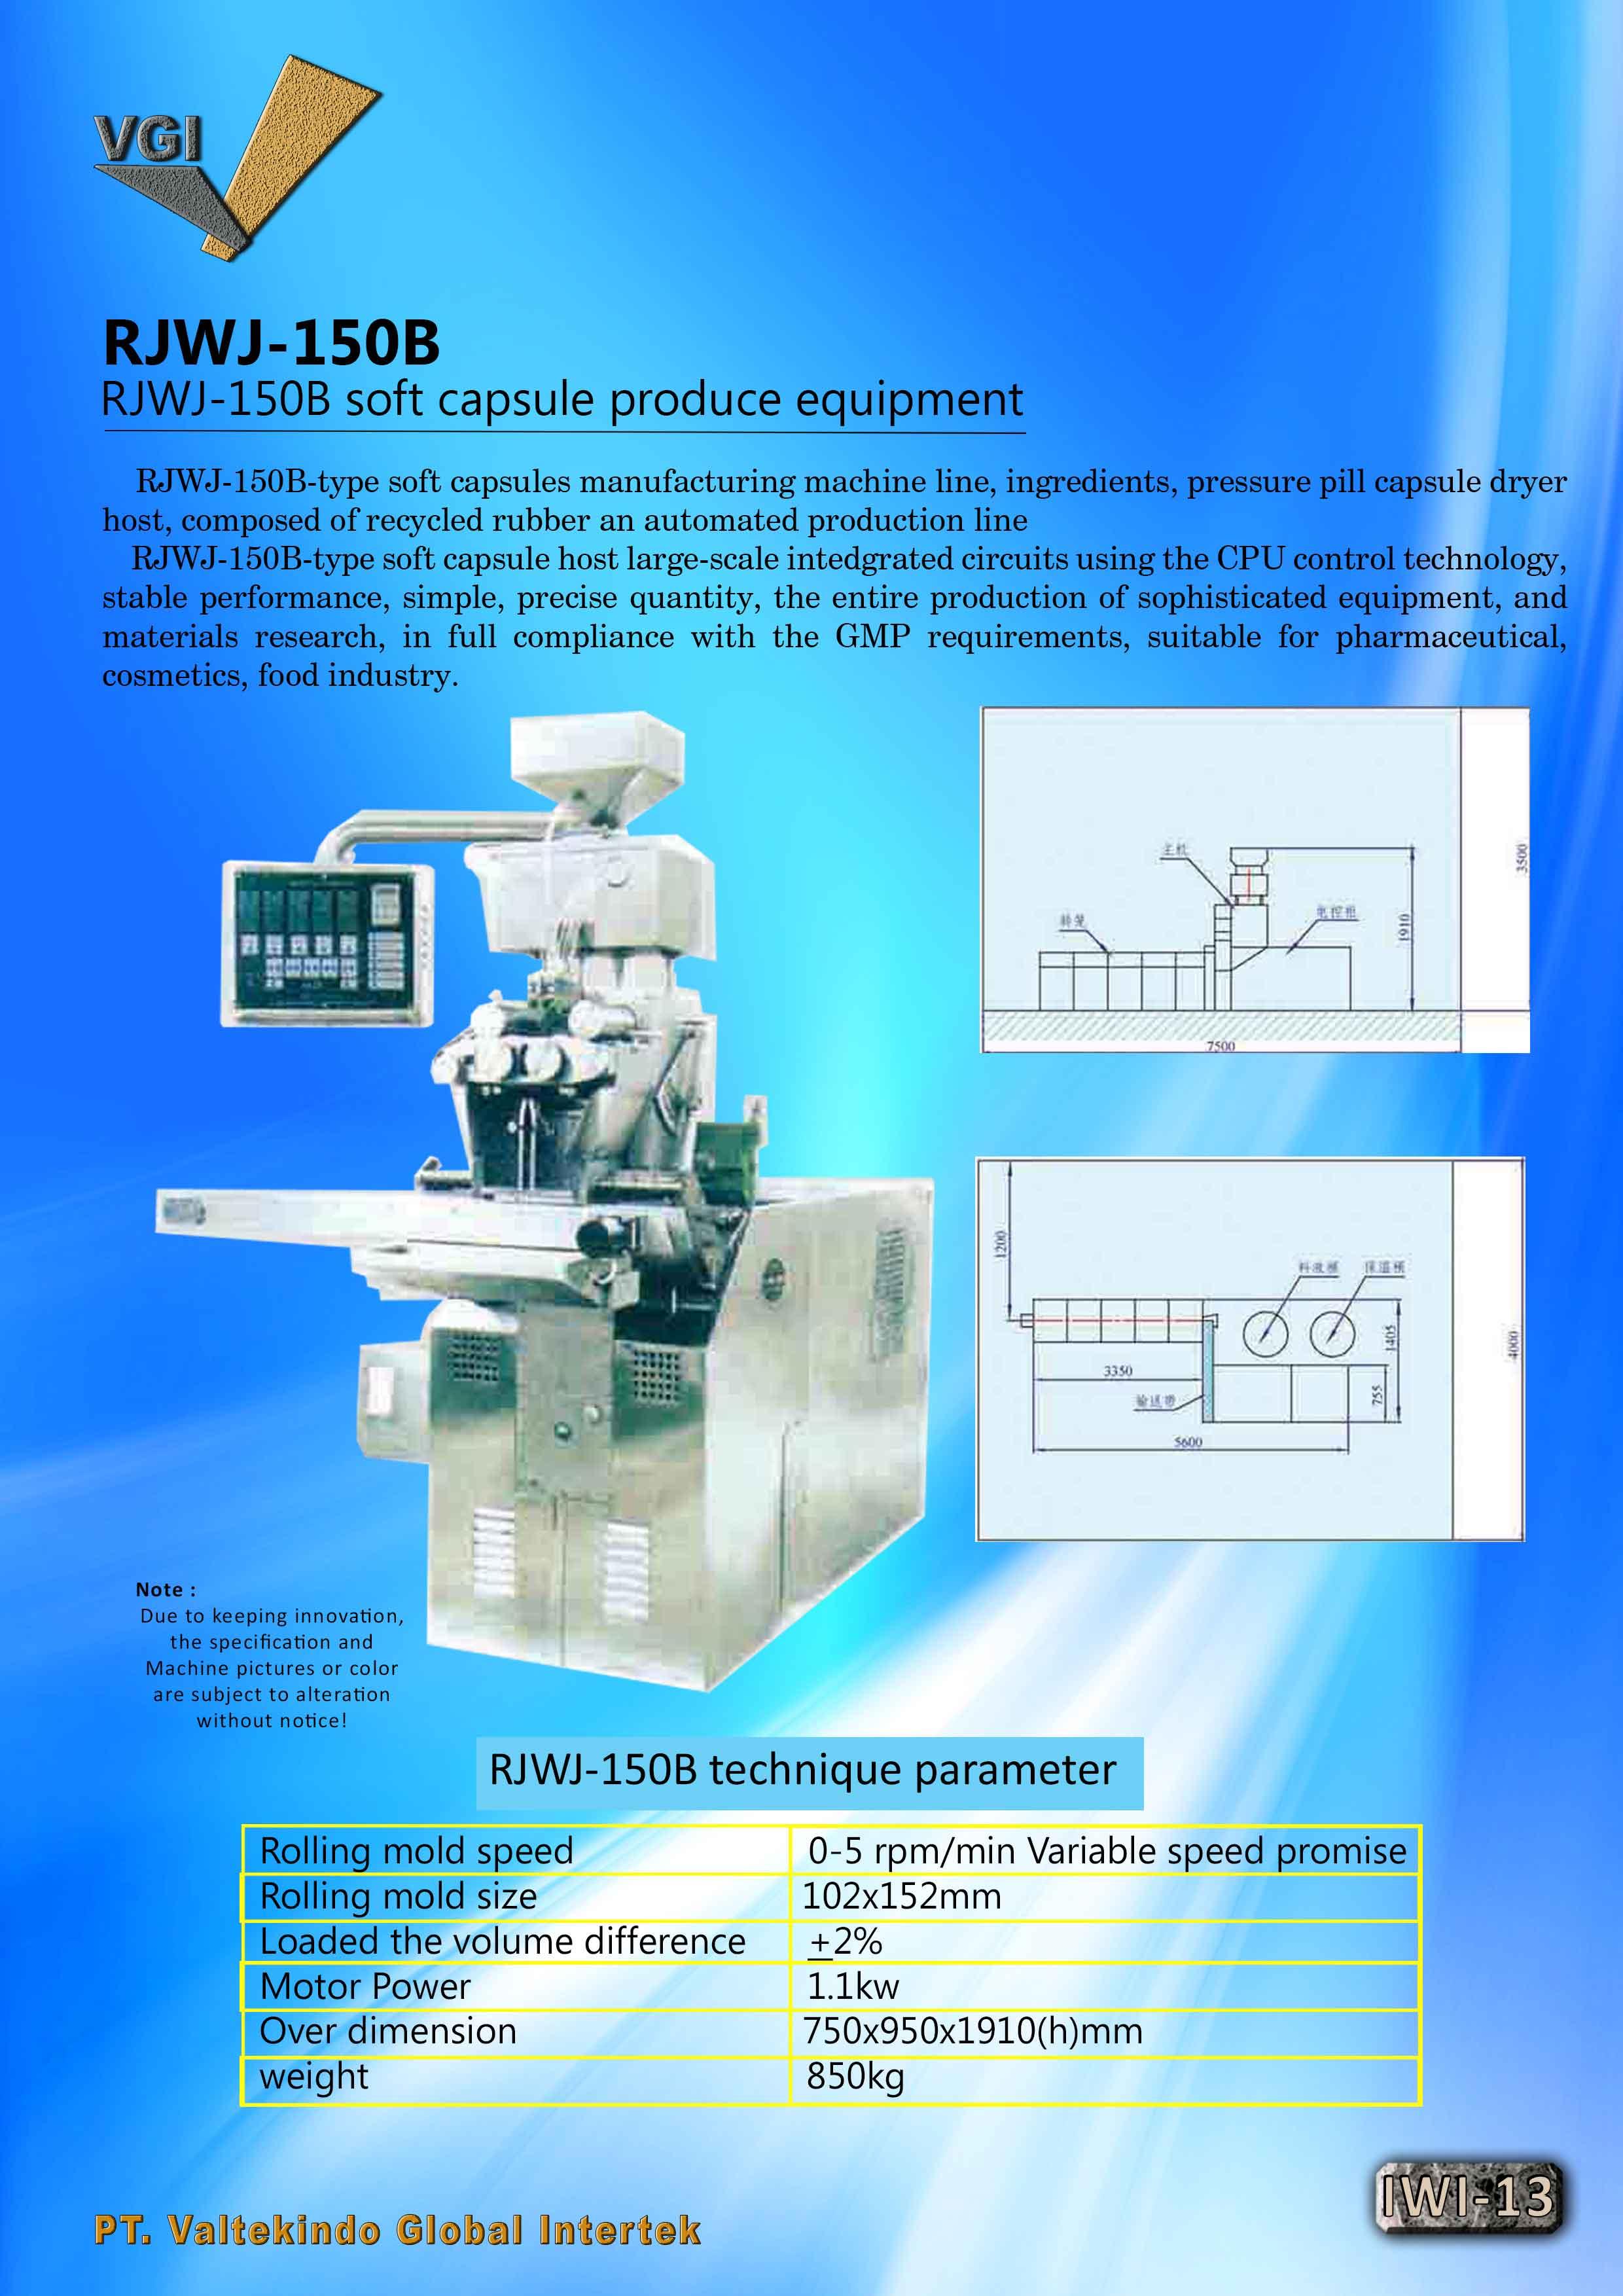 jual mesin Soft Capsule Produce Equipment2 Soft Capsule Produce Equipment2